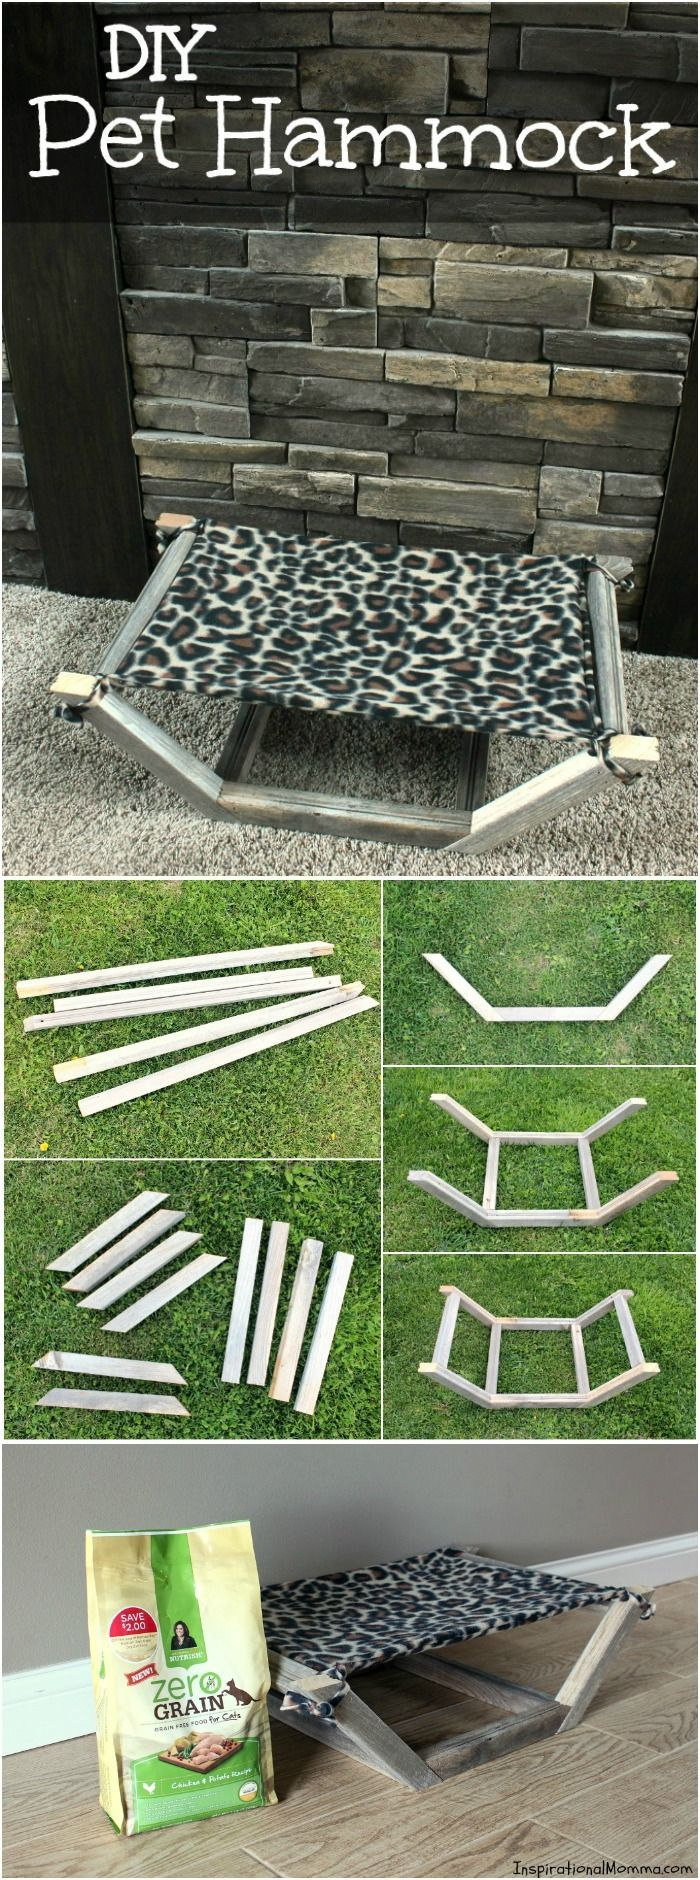 hammock swing diy indoor outdoor bed dog